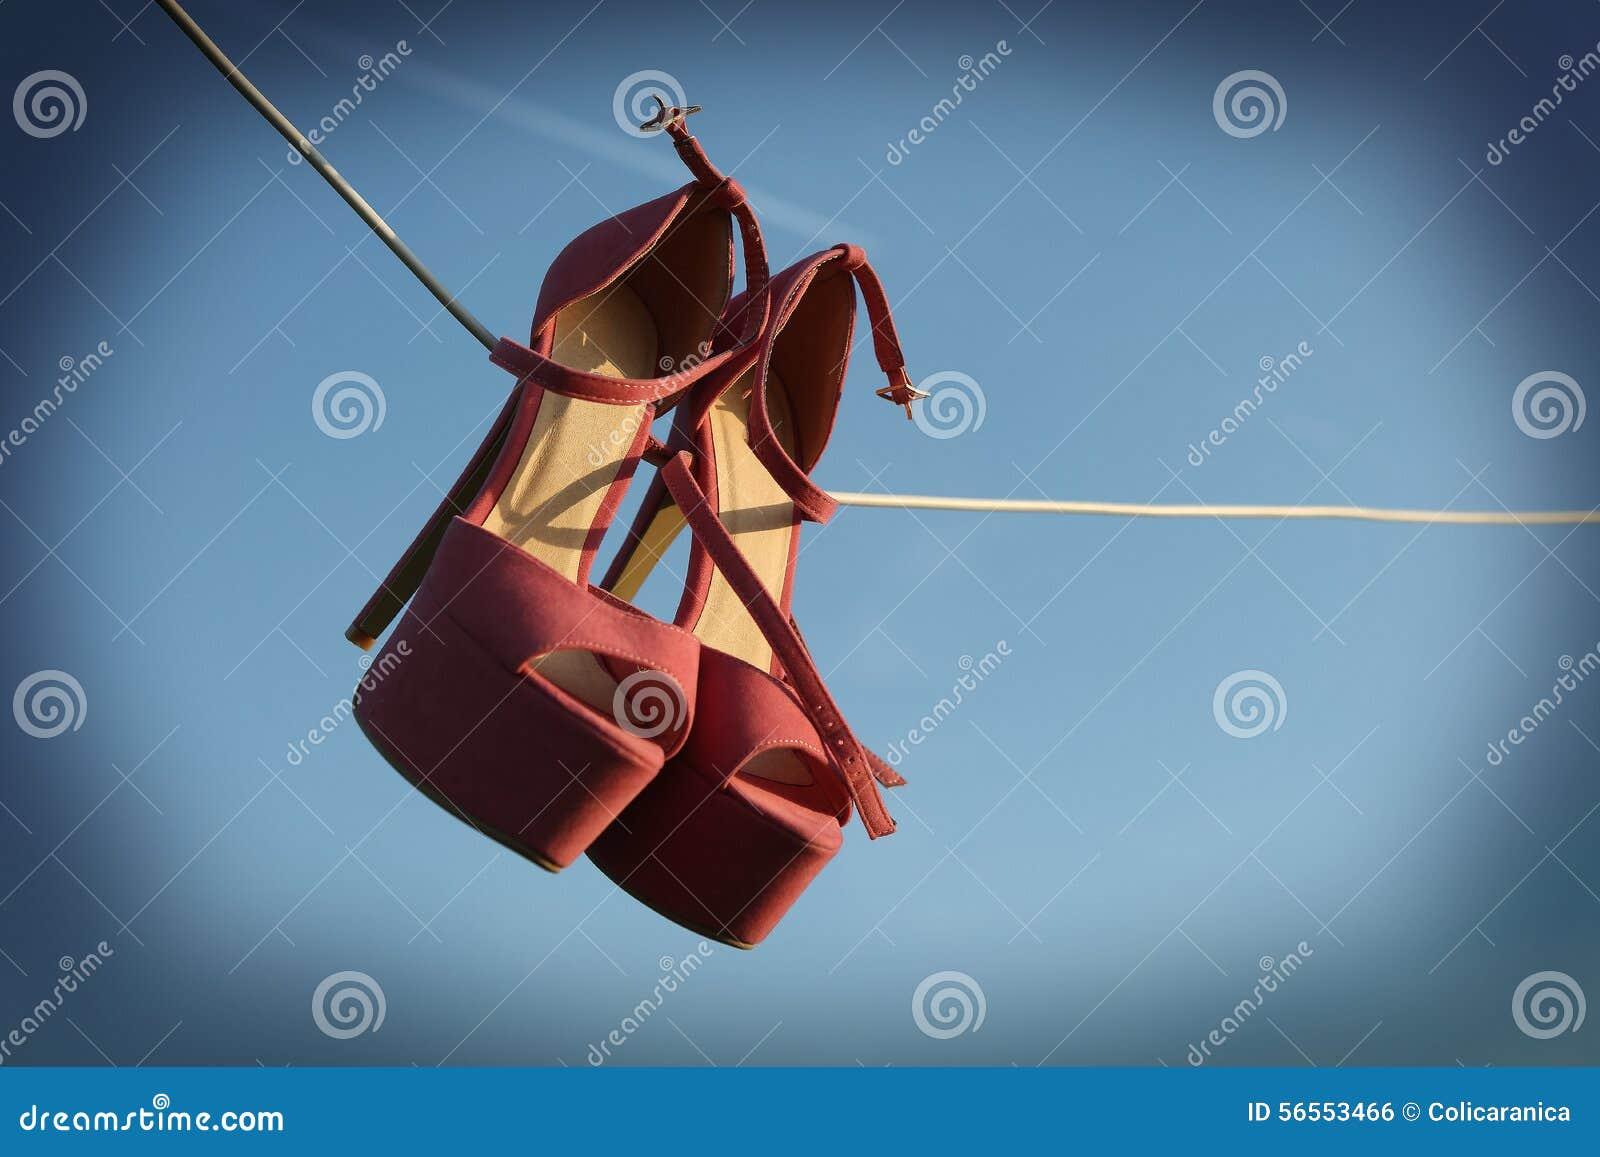 Download Ρόδινα τακούνια σε ένα καλώδιο Στοκ Εικόνες - εικόνα από πλύσιμο, υπαίθριος: 56553466